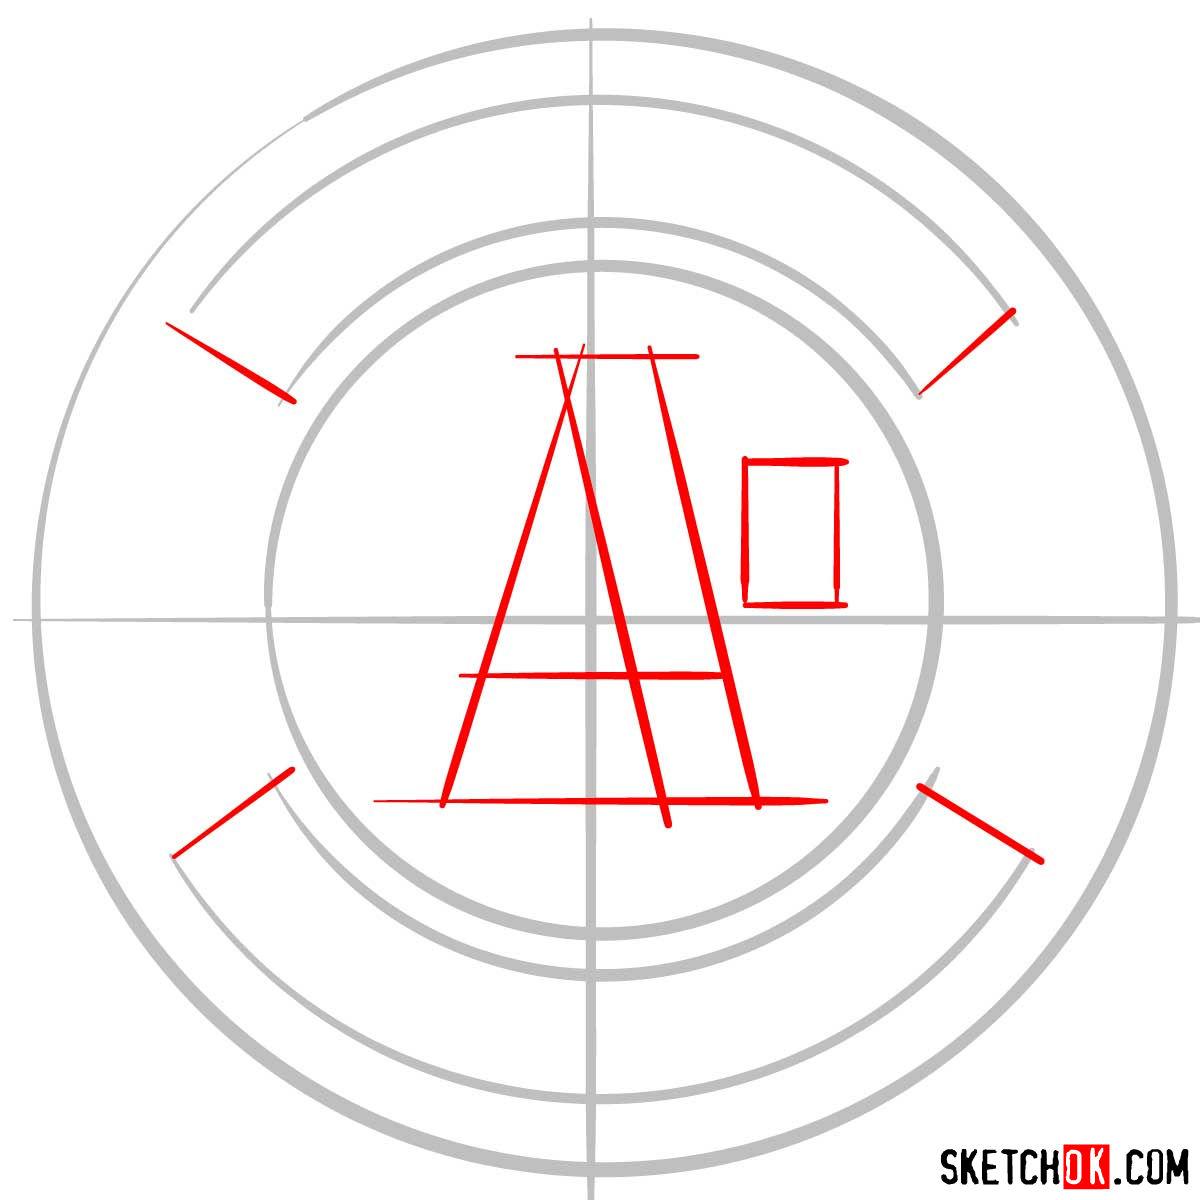 How to draw Oakland Athletics logo | MLB logos - step 02